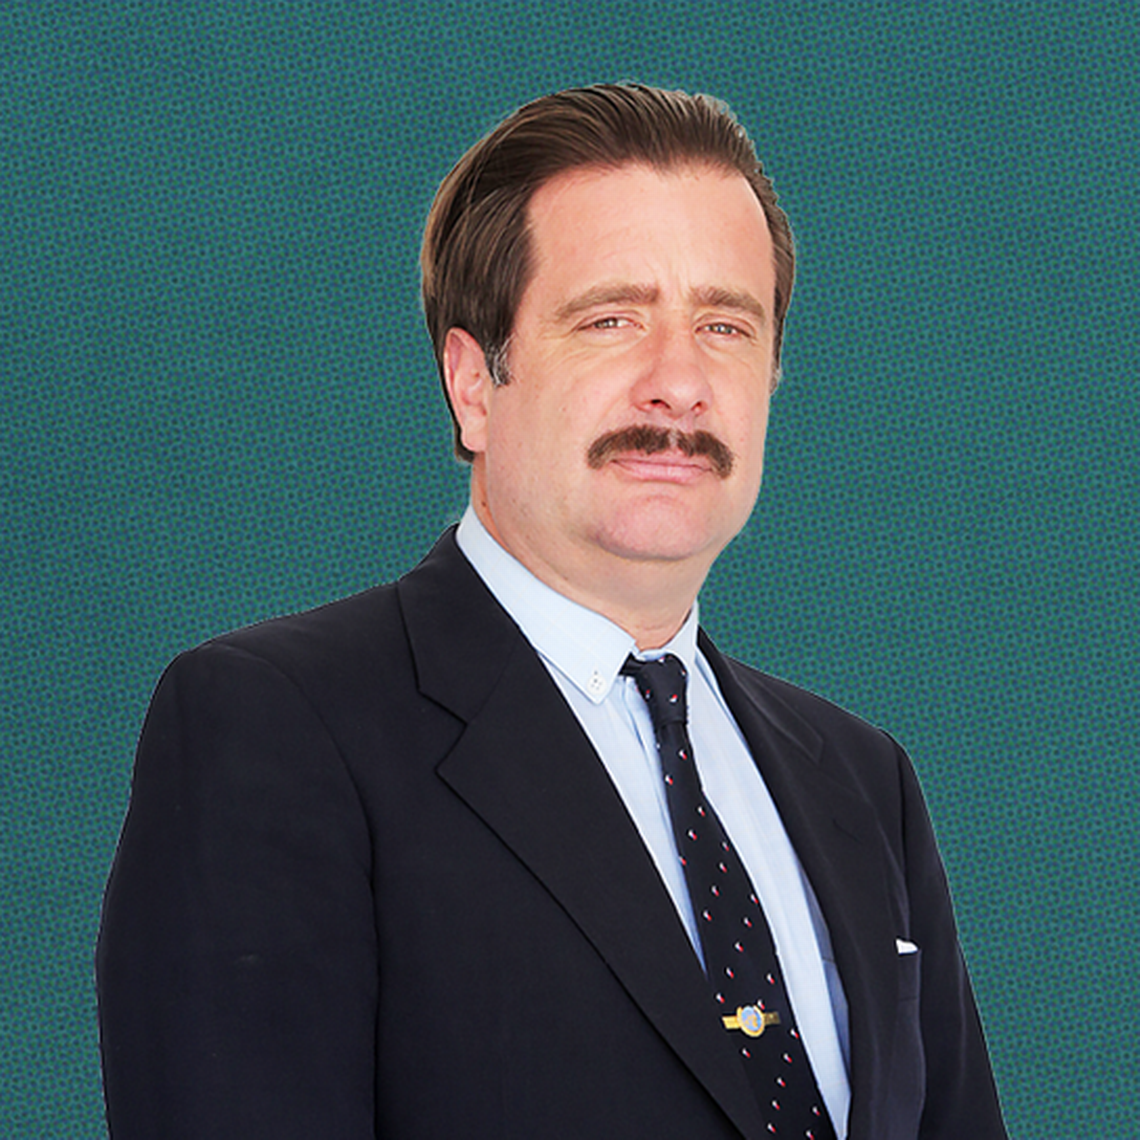 Carlos Dittborn